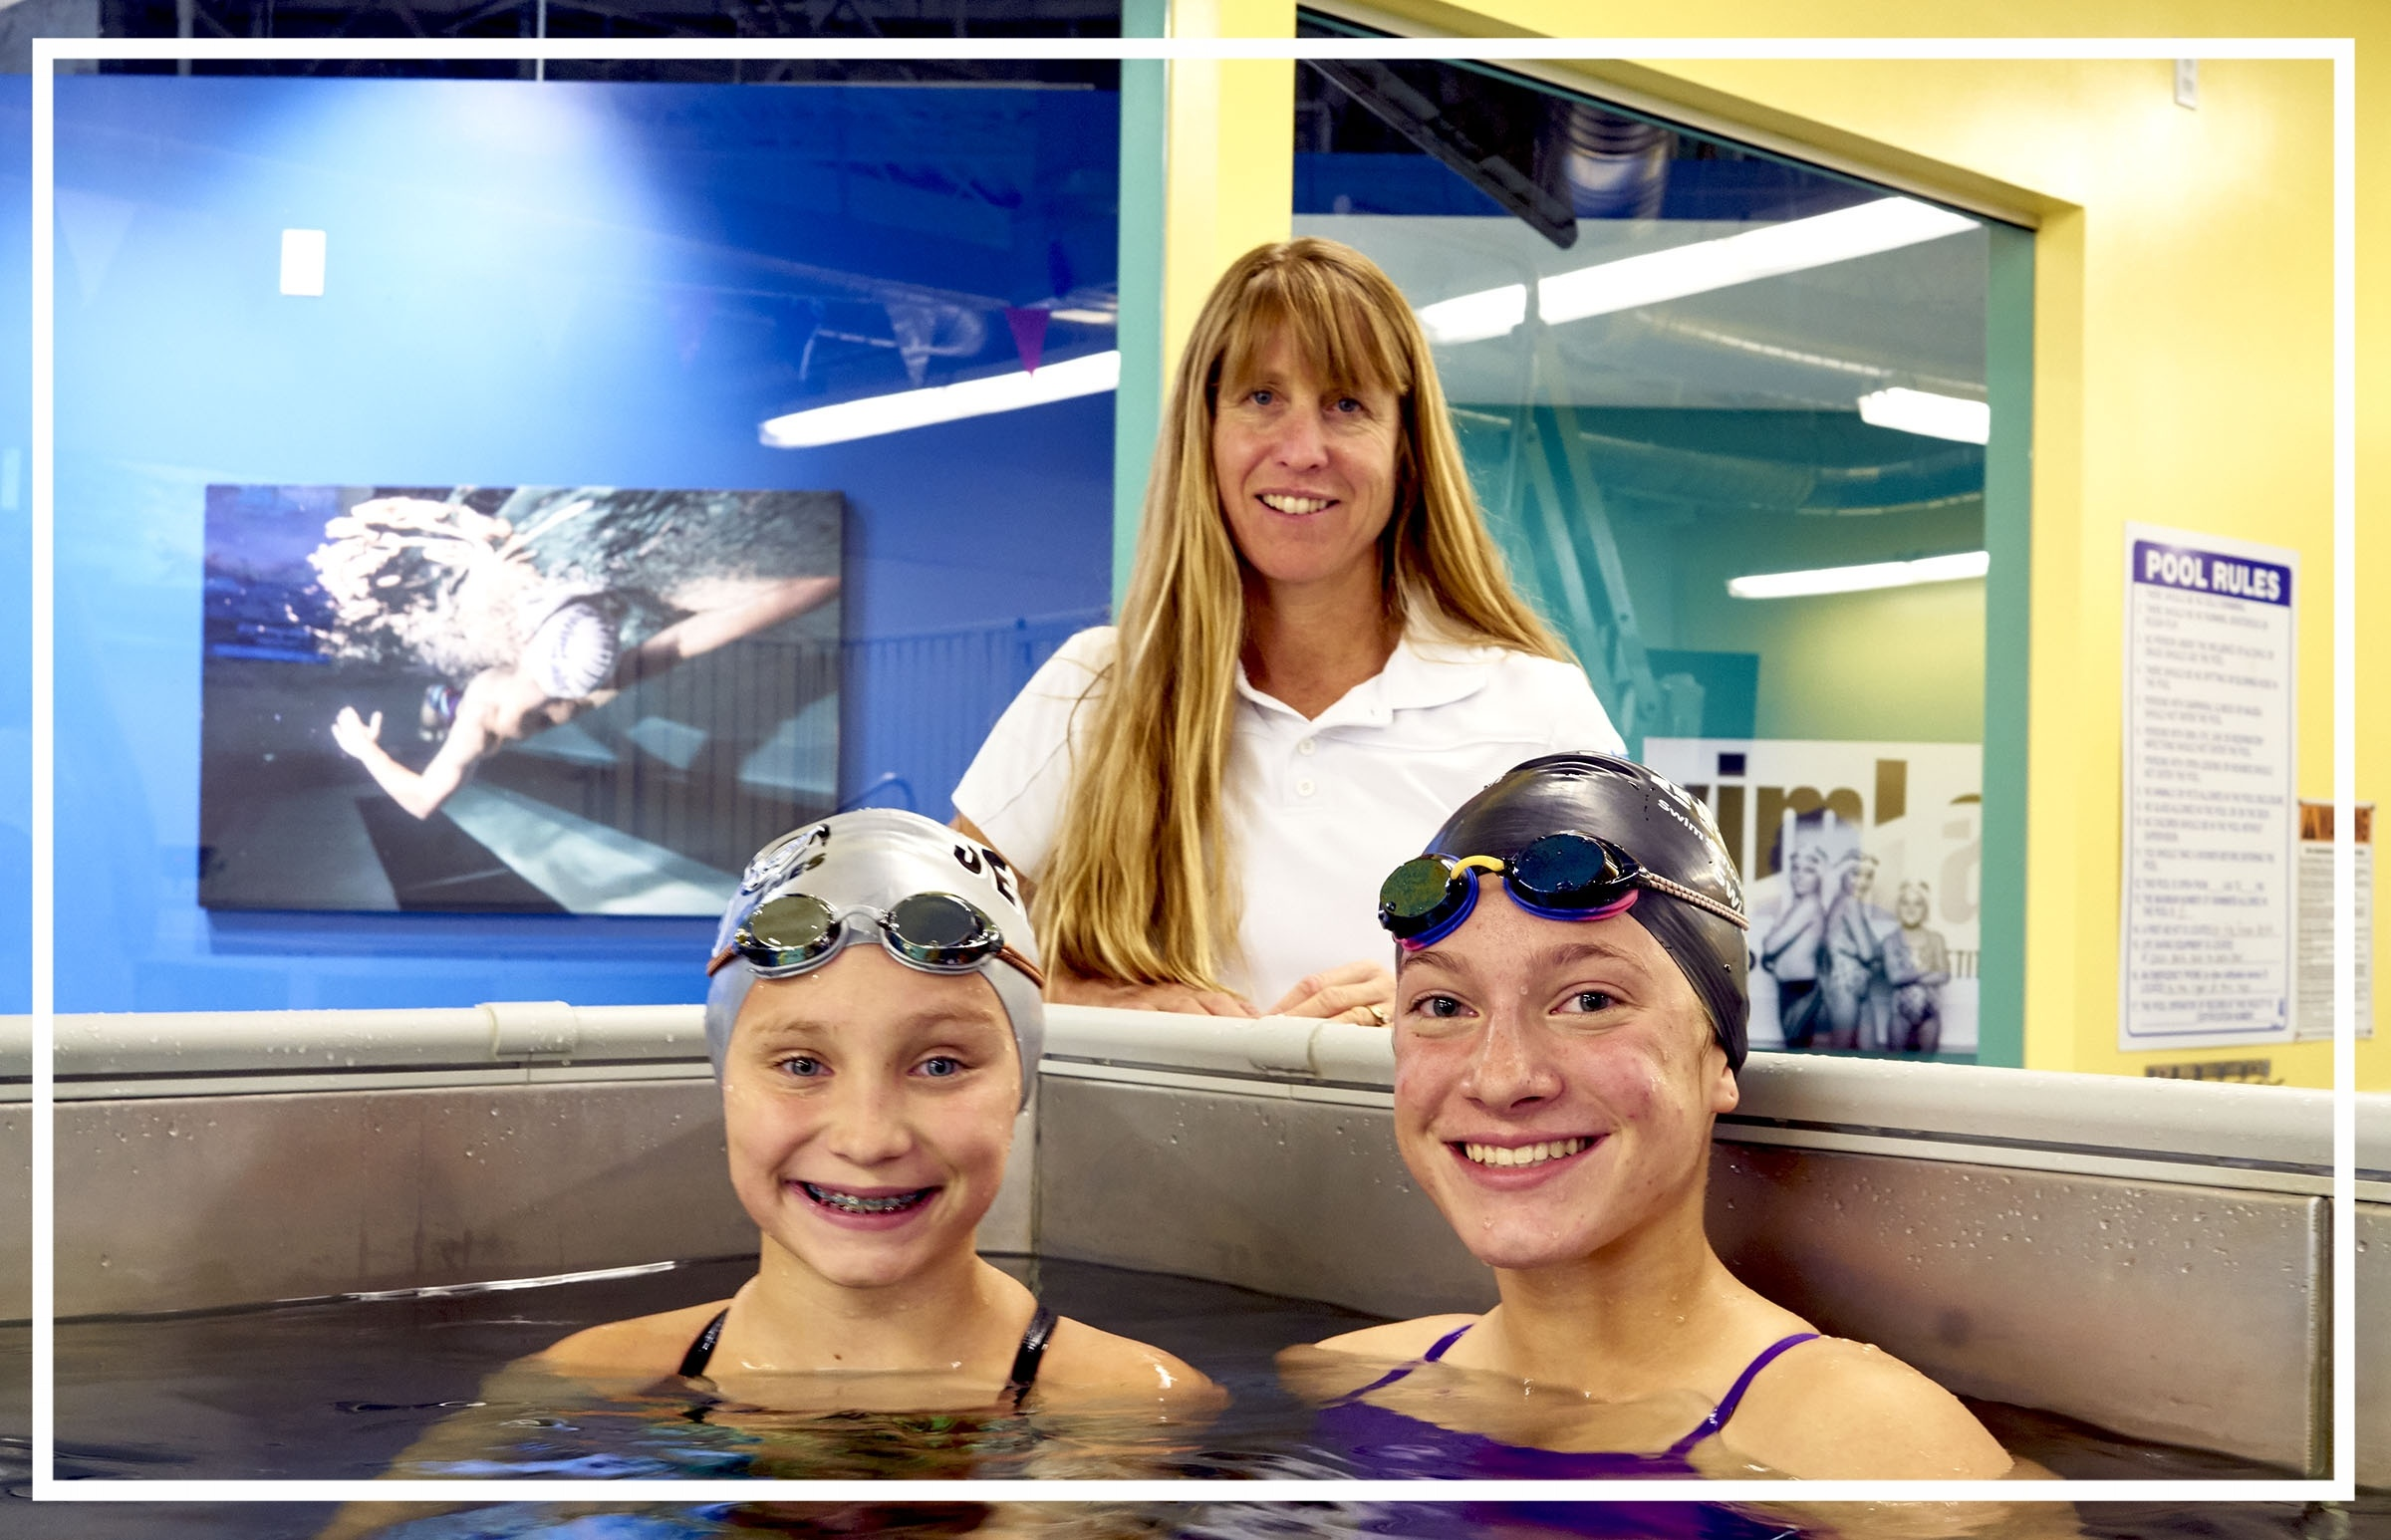 Shot10_CompetitiveSwim163-303598-edited.jpg